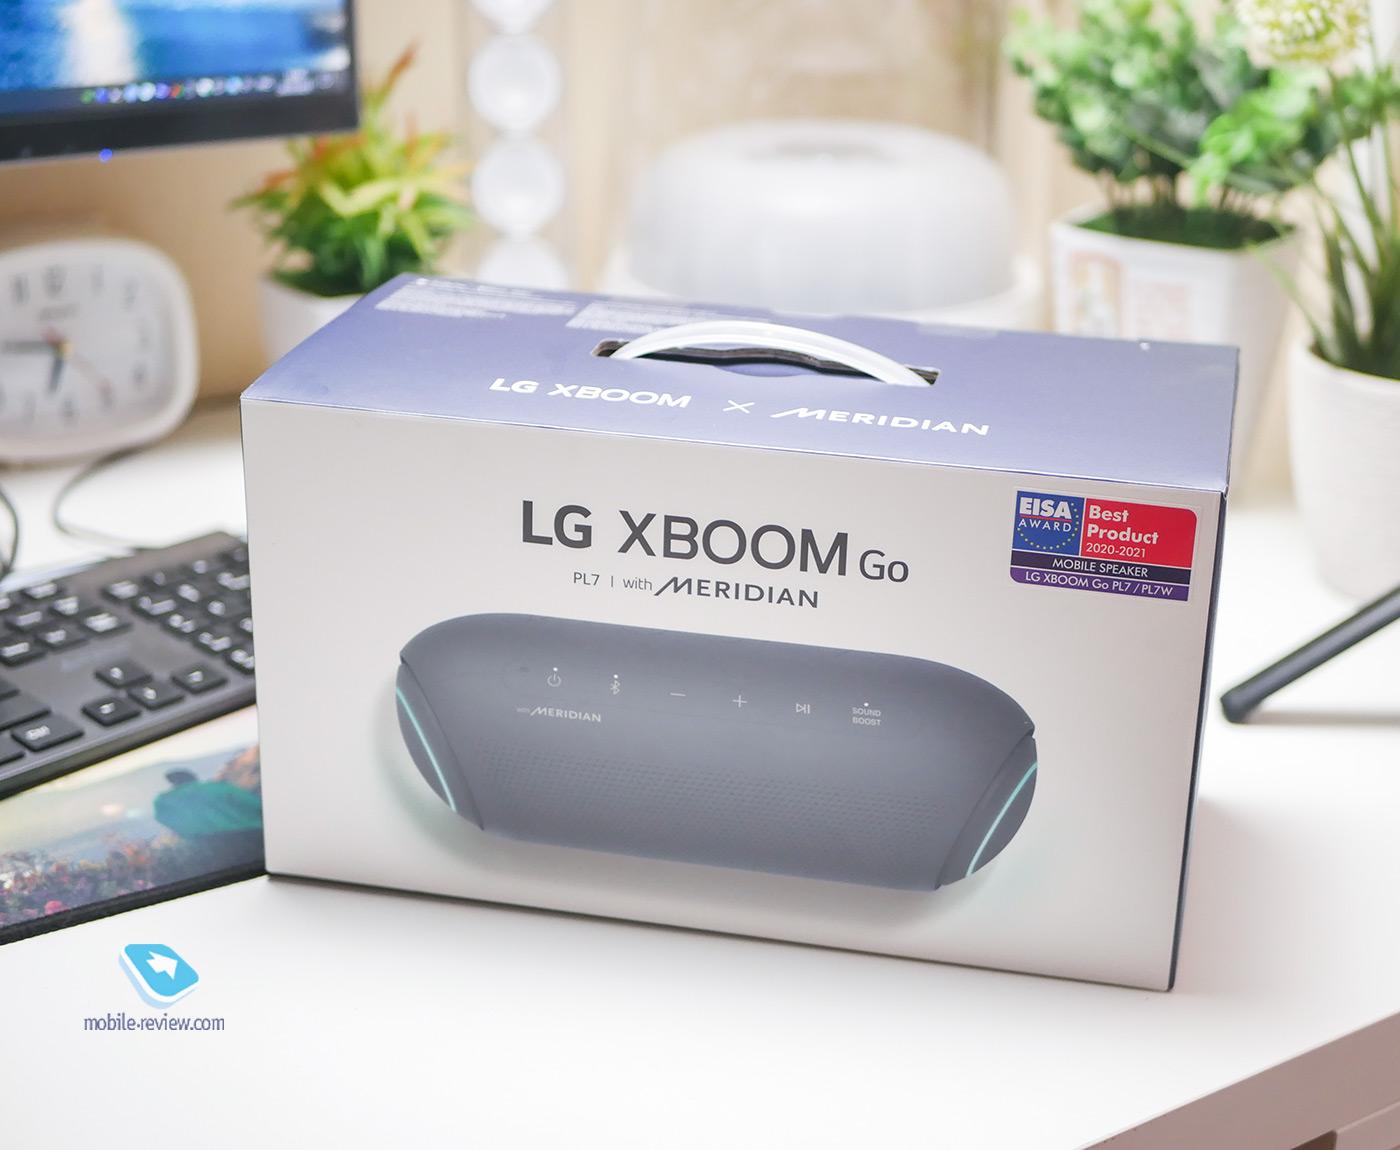 Обзор LG Xboom Go (PL7) – «и швец, и жнец, и на дуде игрец»